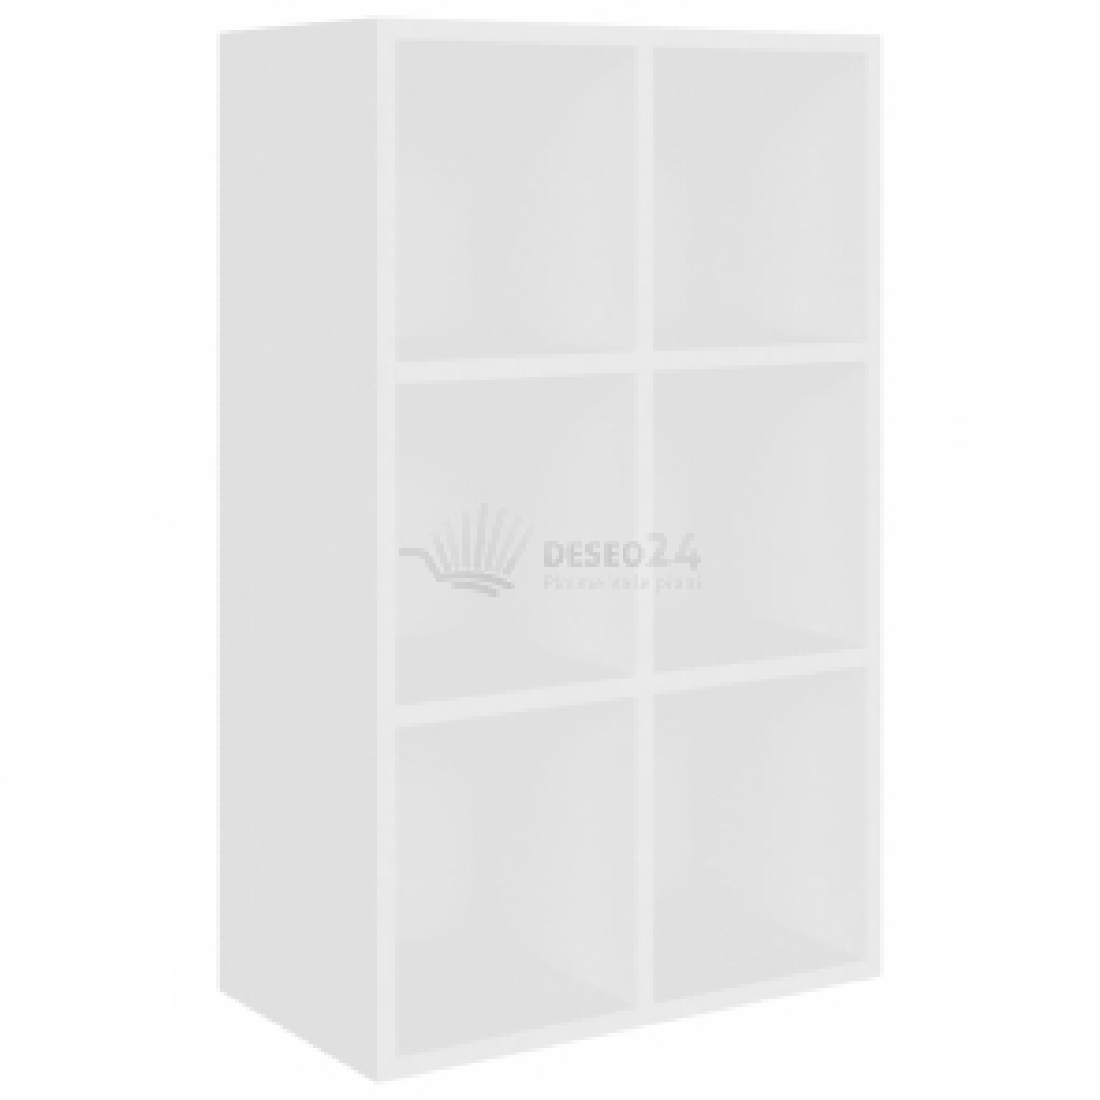 vidaXL Knihovna/příborník bílá 66 x 30 x 97,8 cm dřevotříska [800342]